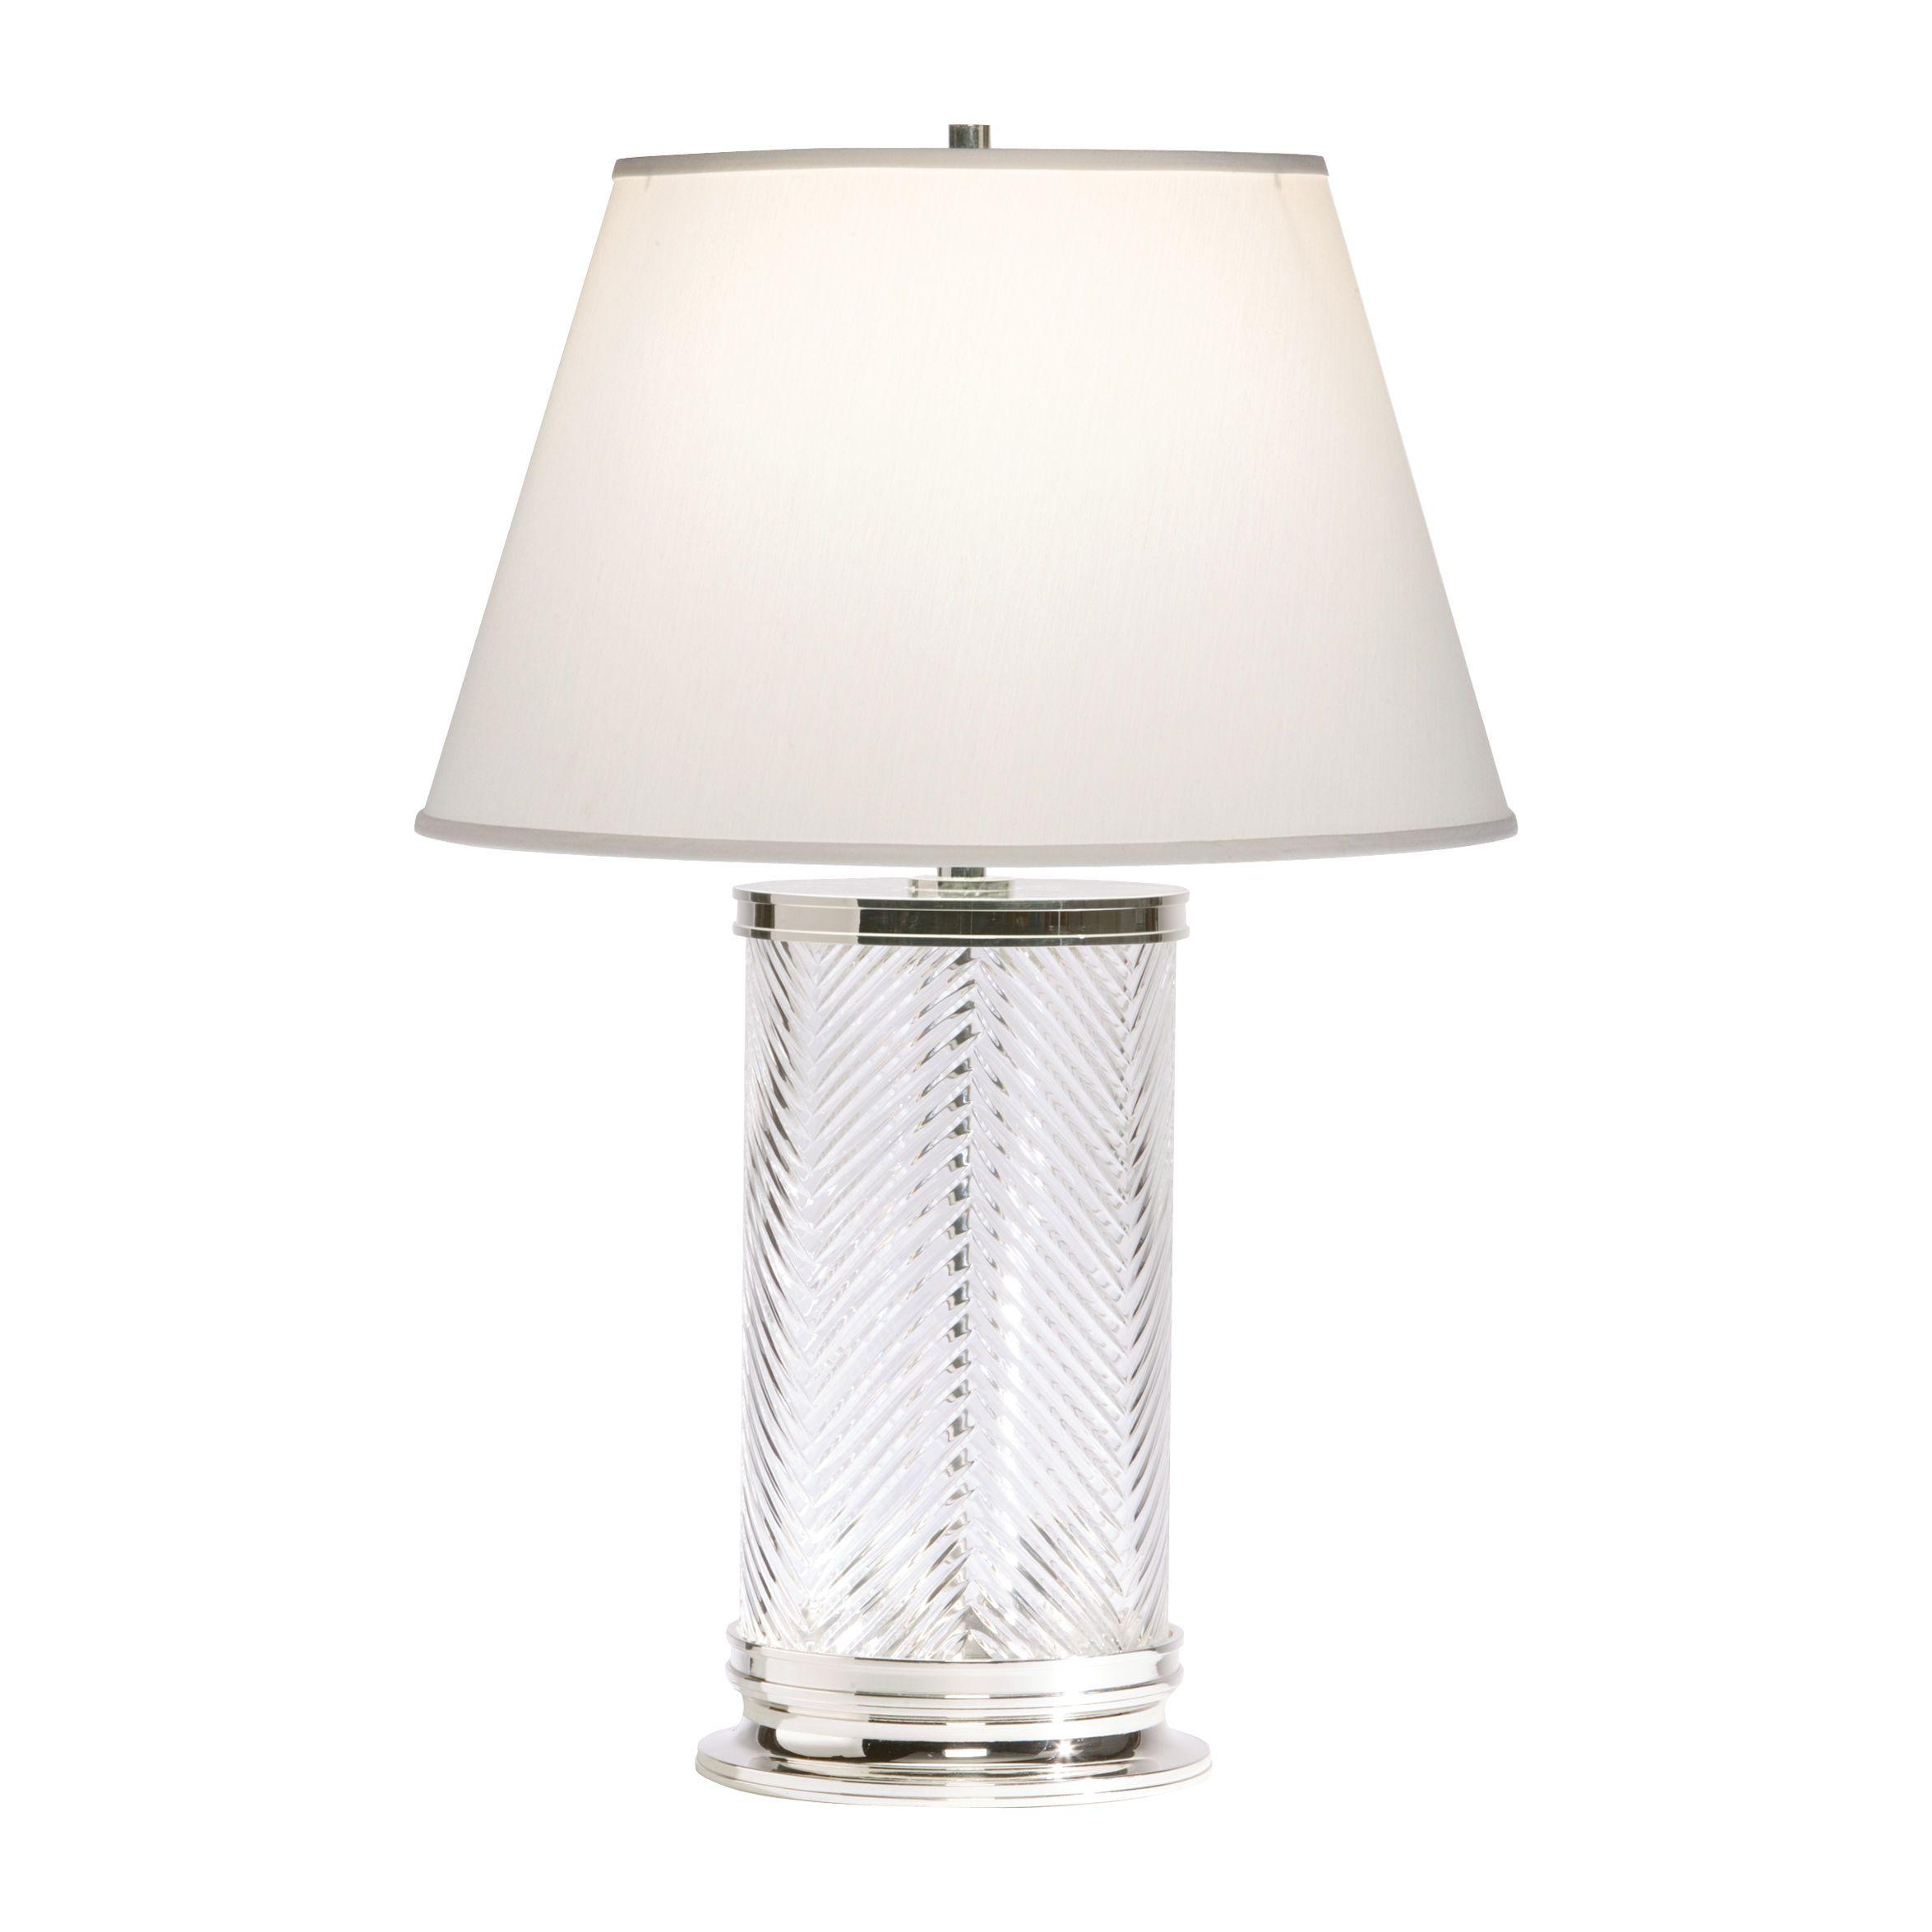 Herringbone crystal table lamp ethan allen us lamps pinterest herringbone crystal table lamp ethan allen us aloadofball Image collections